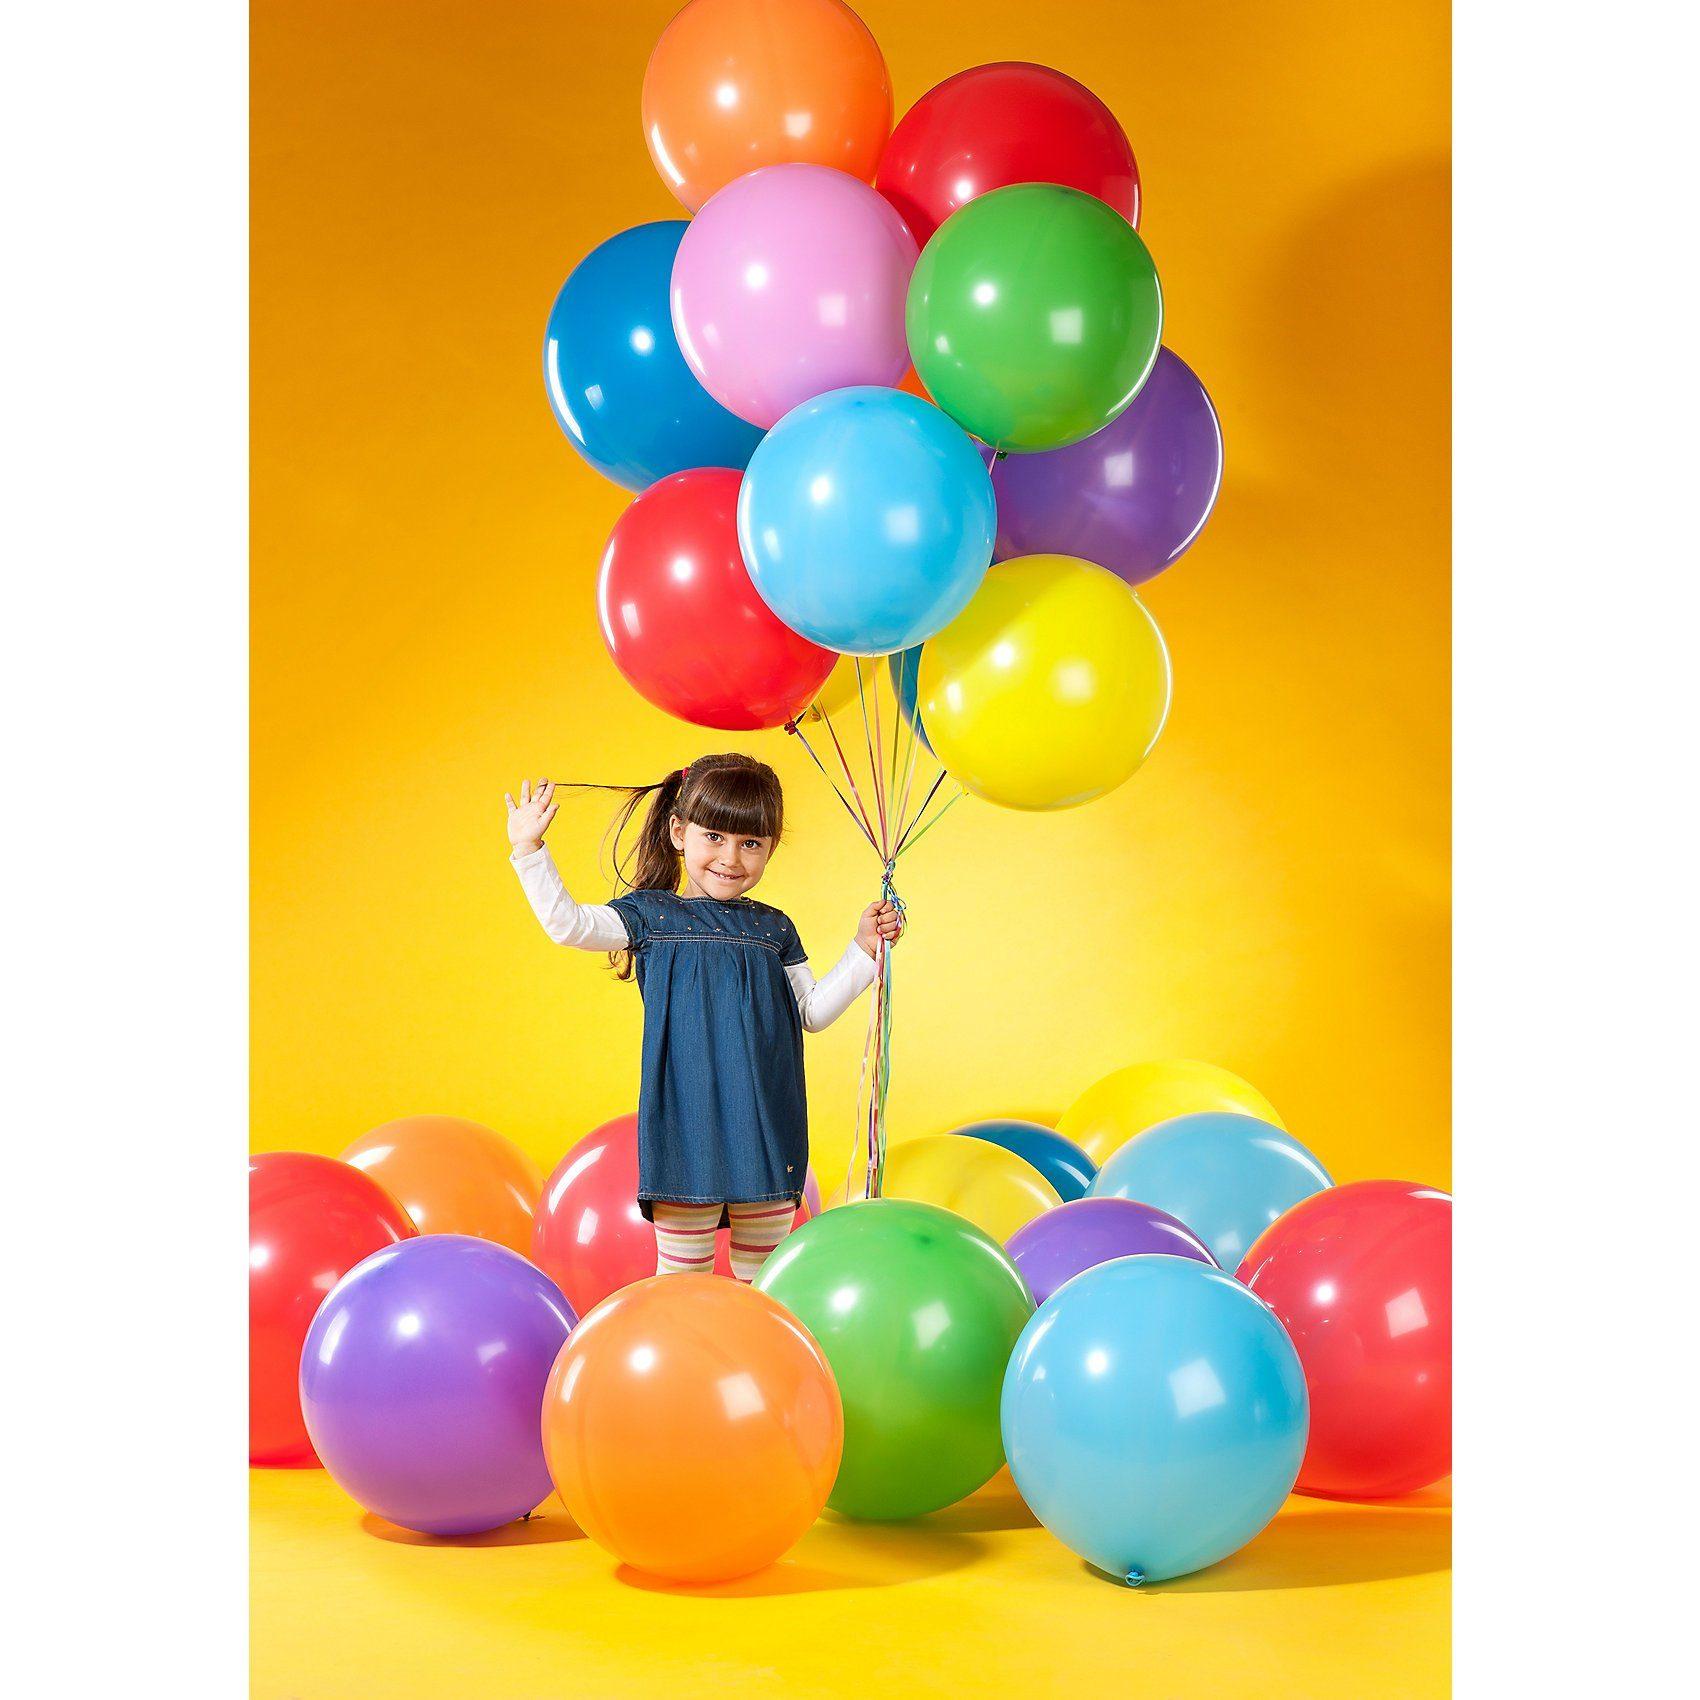 Karaloon Riesenluftballons, 50 Stück